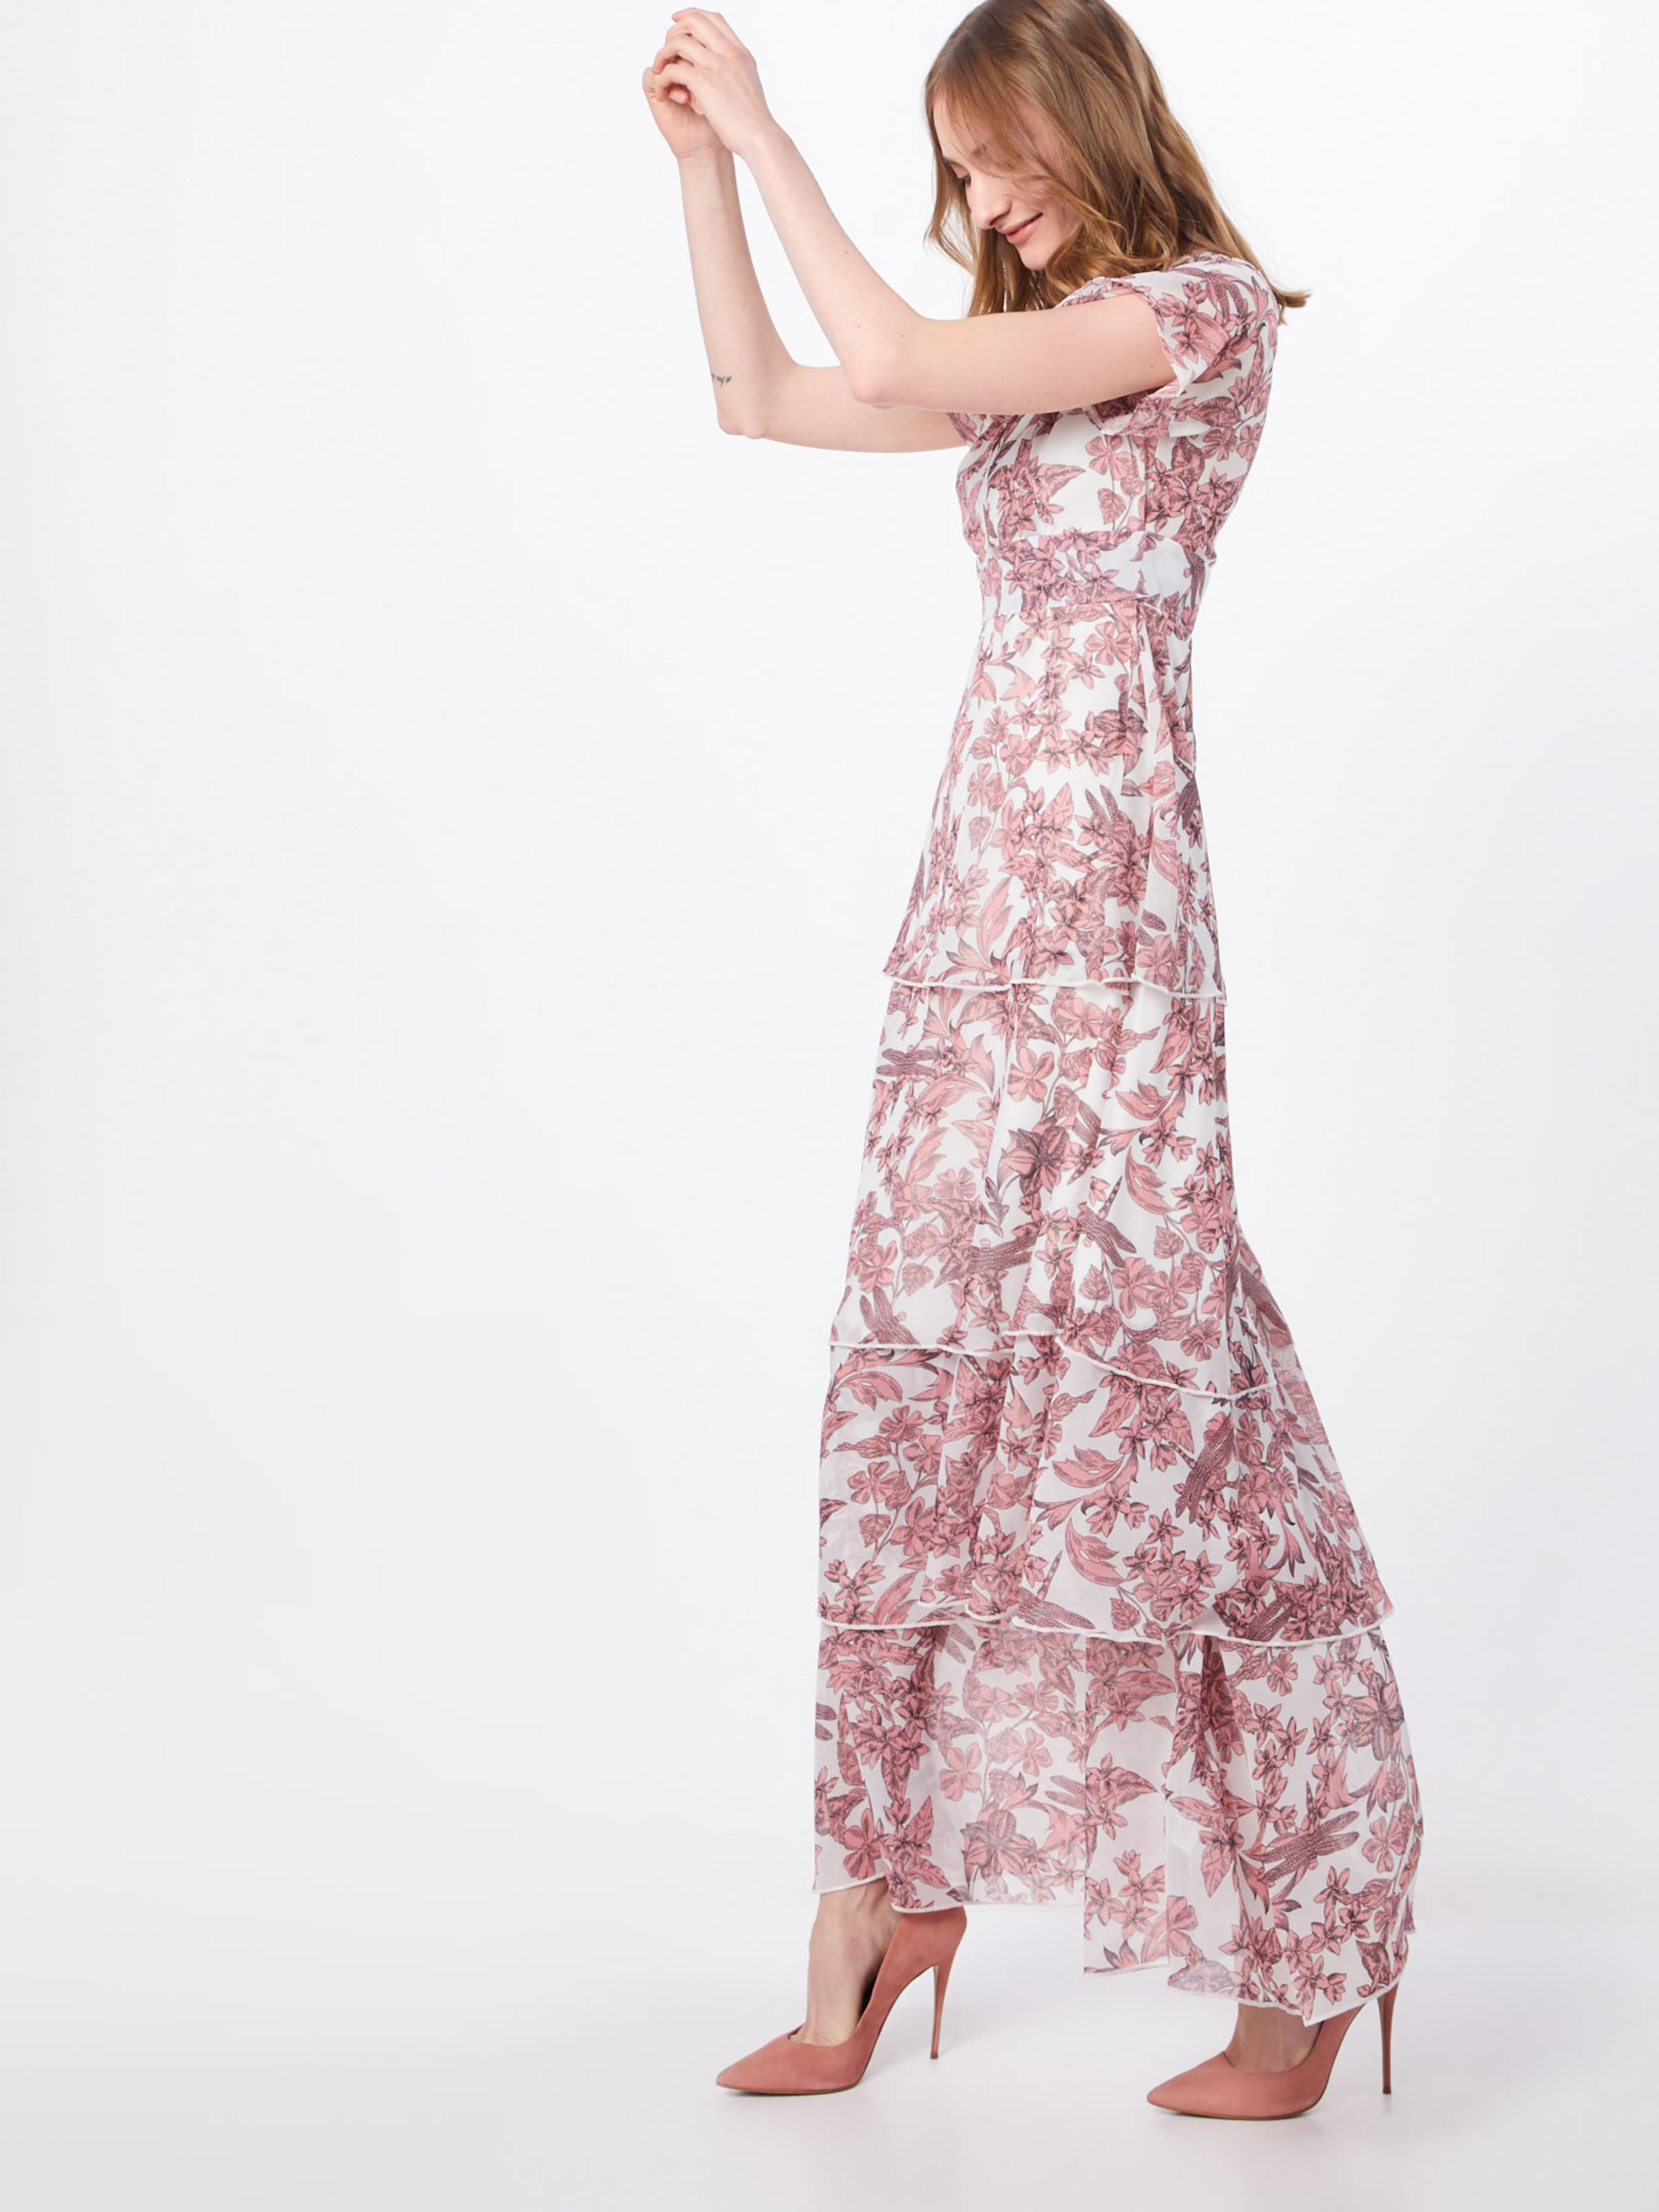 Robe De Missguided 'floral En RoséBlanc Layered' Frill Soirée oedxCB